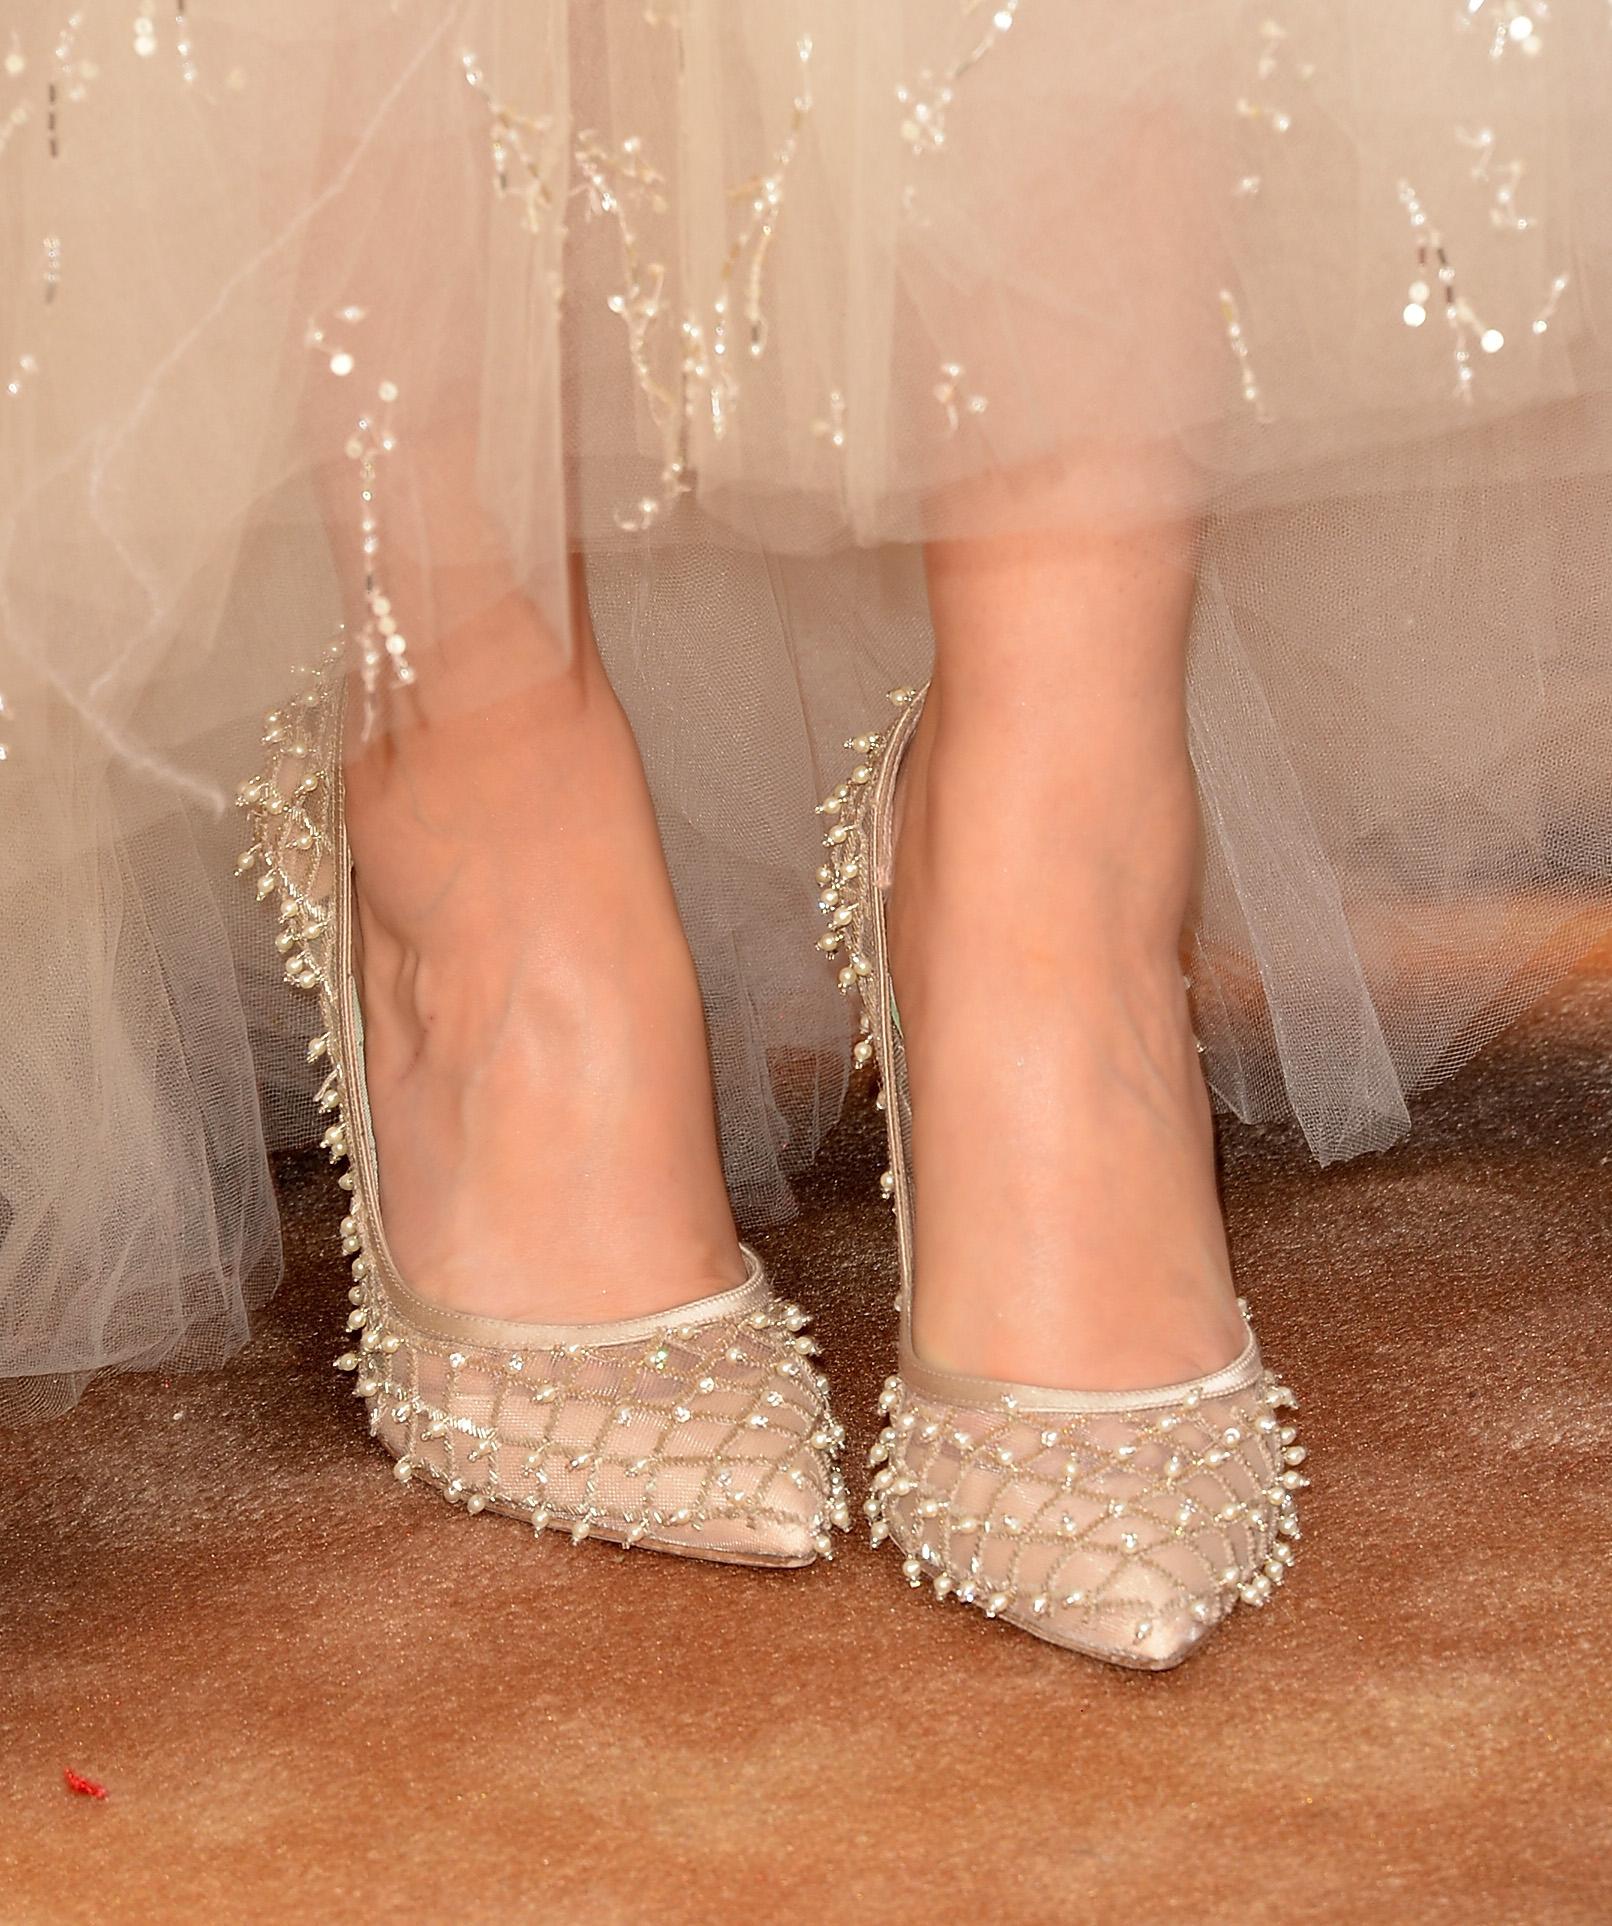 Zooey Deschanel showed off pearl-embellished heels fit for a princess.